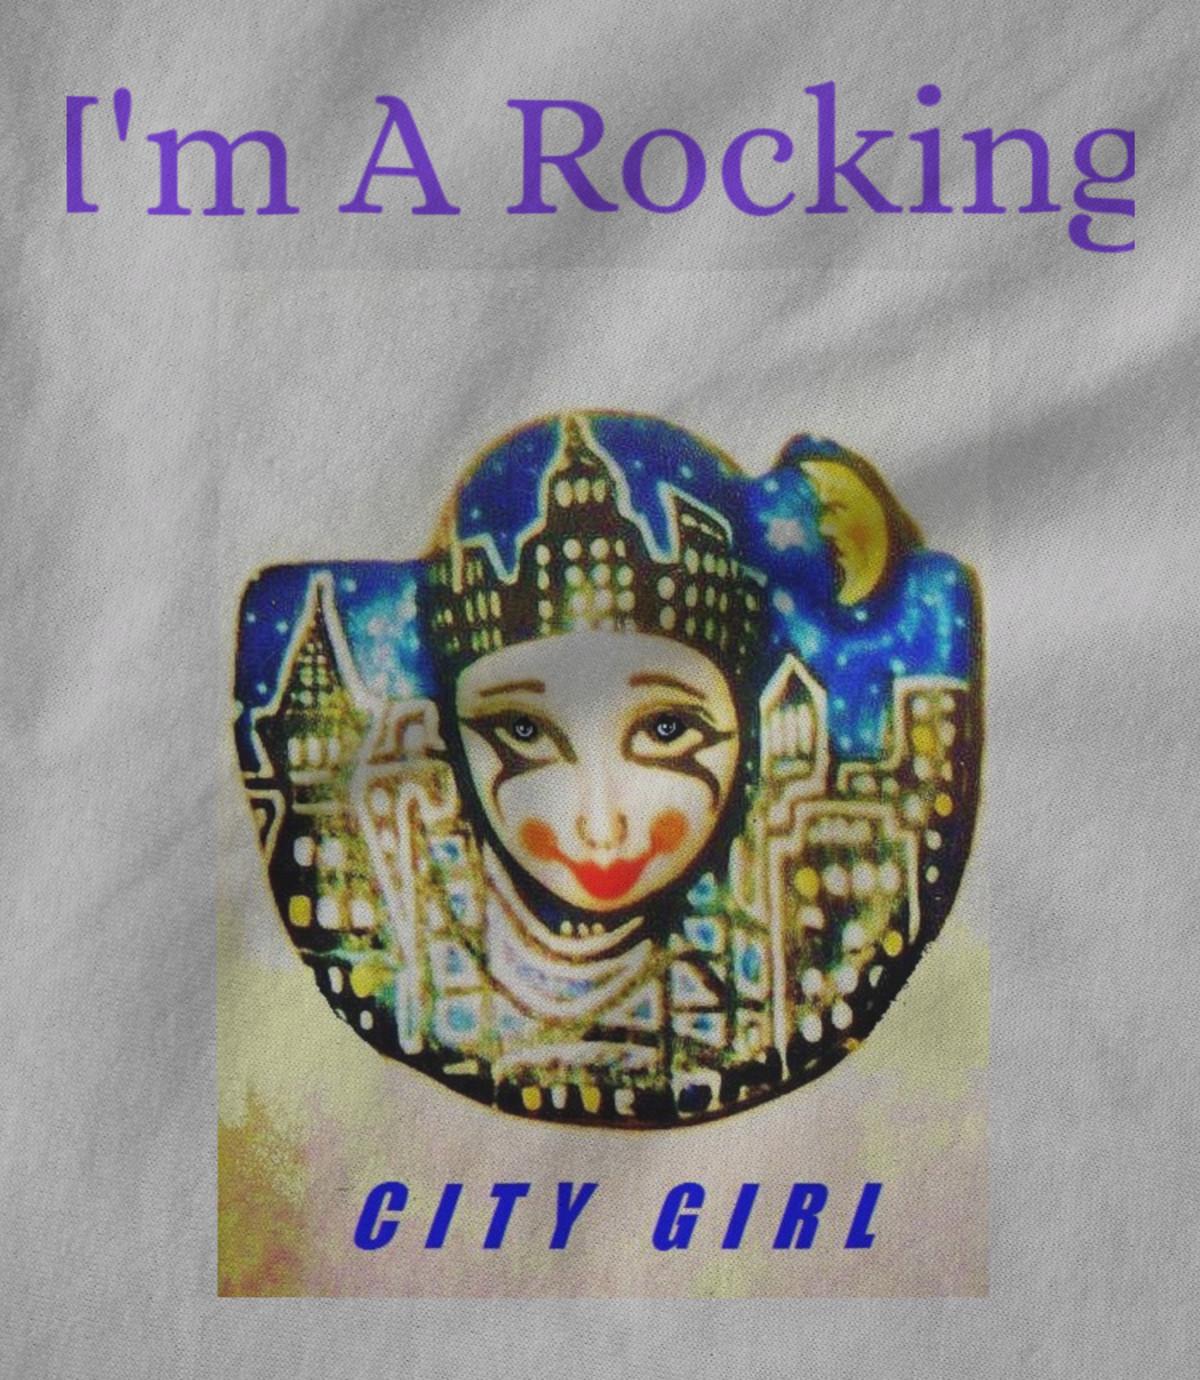 Matthew f  blowers iii  c 2017 i m a rocking city girl  1505327602